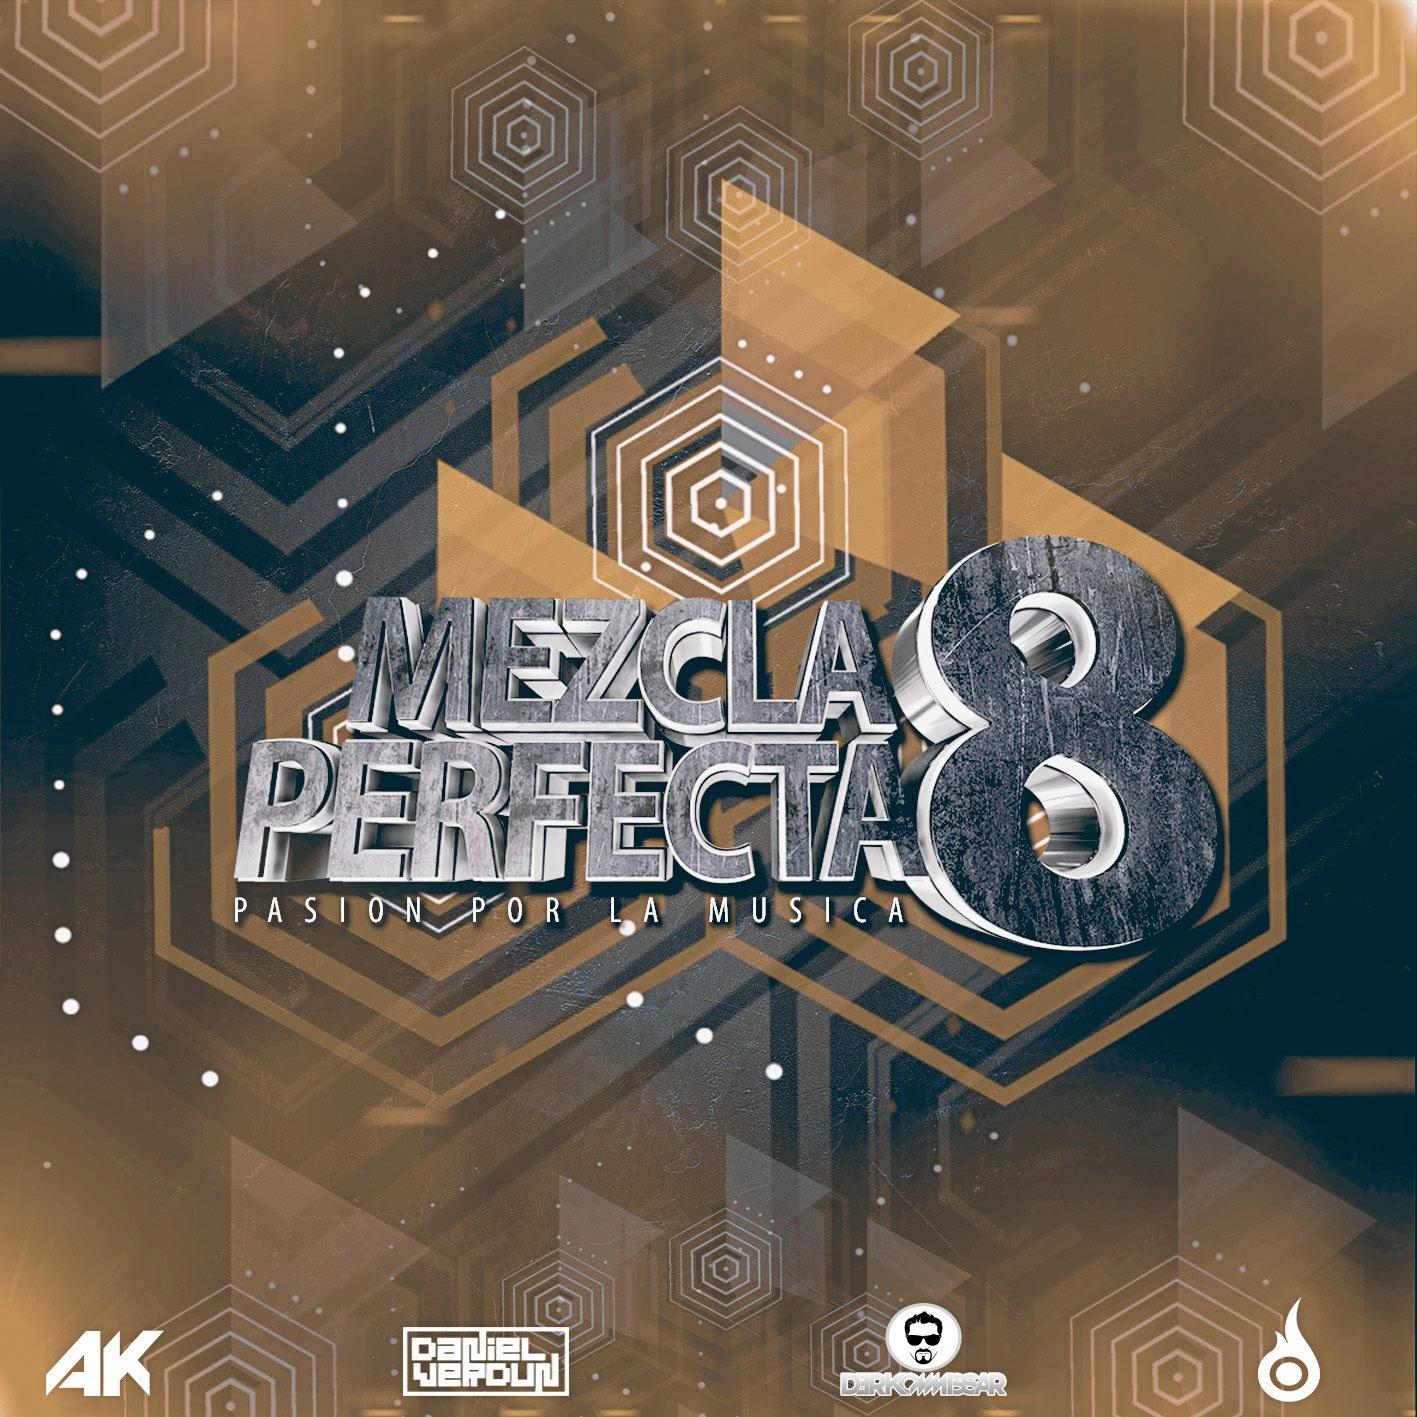 La Mezcla Perfecta 8 Dj Daniel Verdun Ft. Derkommissar (2015)